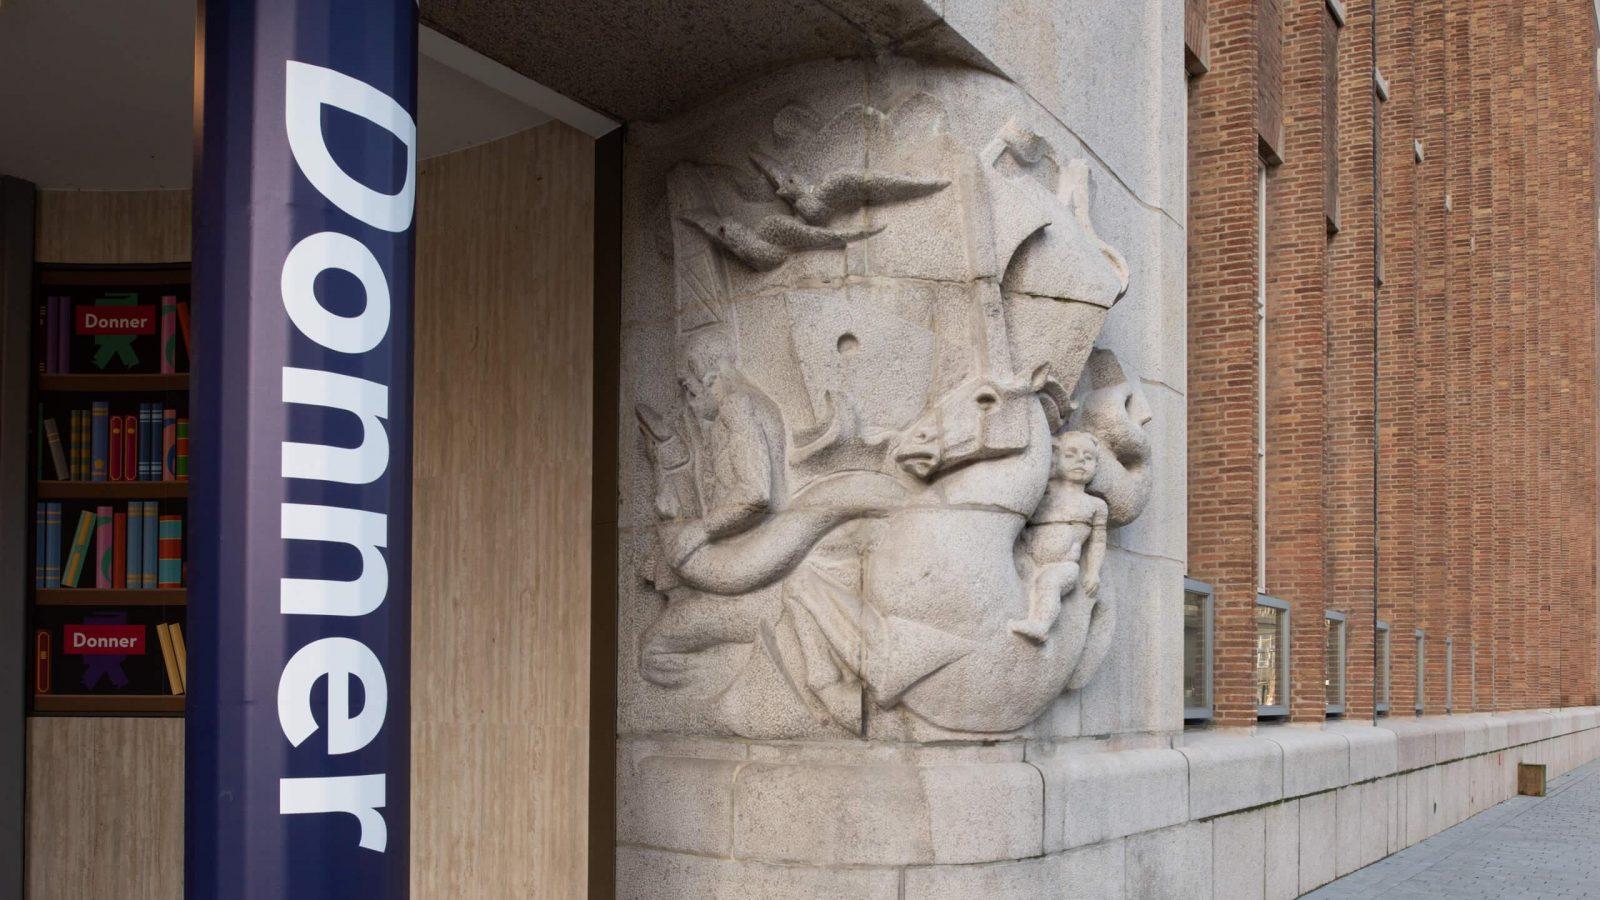 2020 Rotterdamsche Bank ML DSC 7104